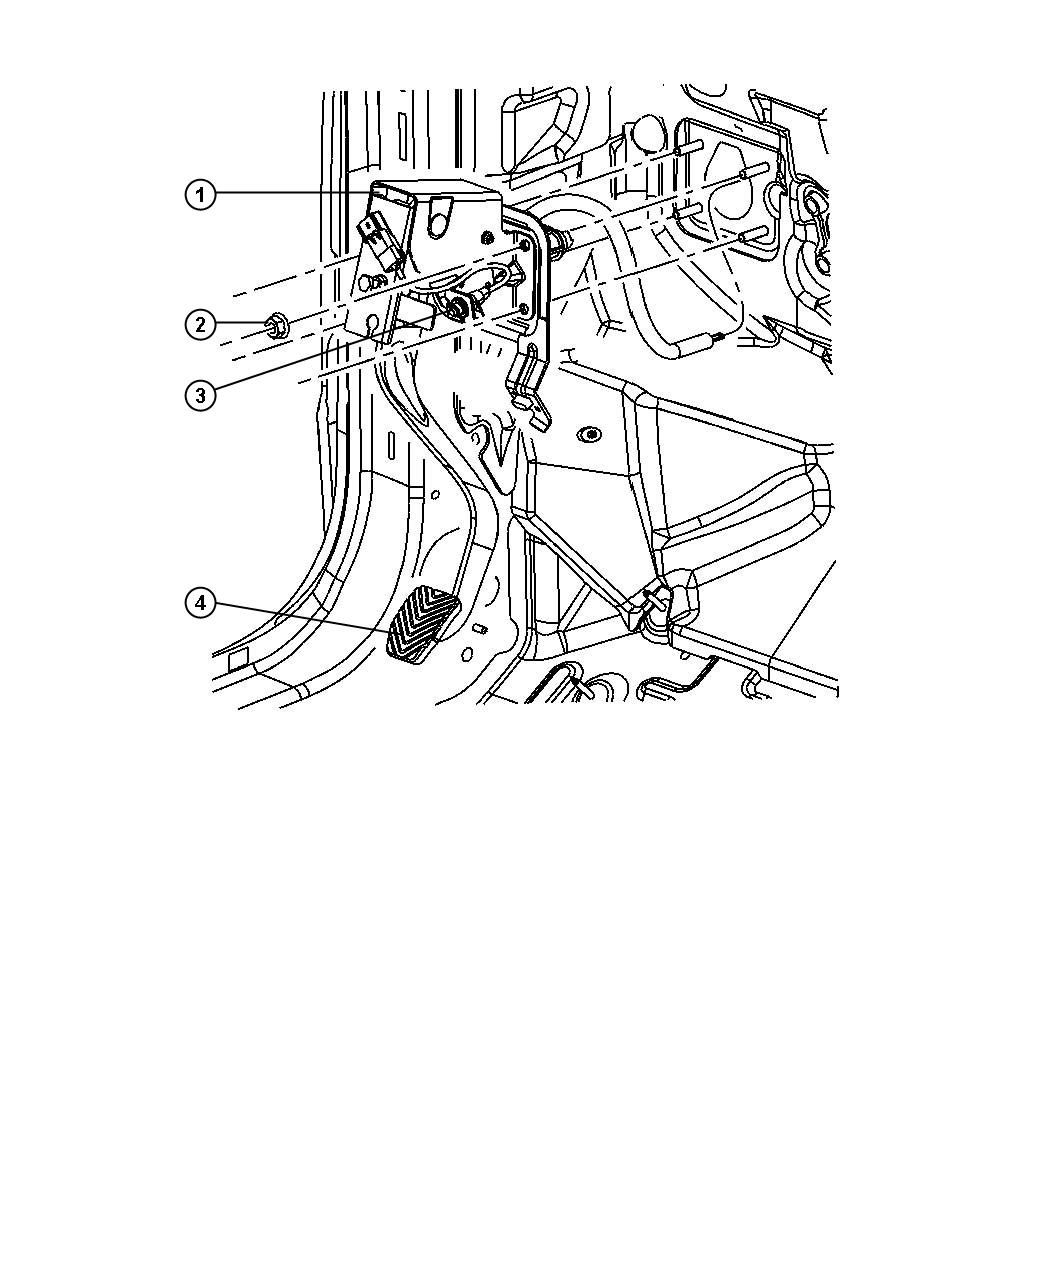 68028426AC - Jeep Pedal. Clutch. [6-speed manual aisin bg6 ...